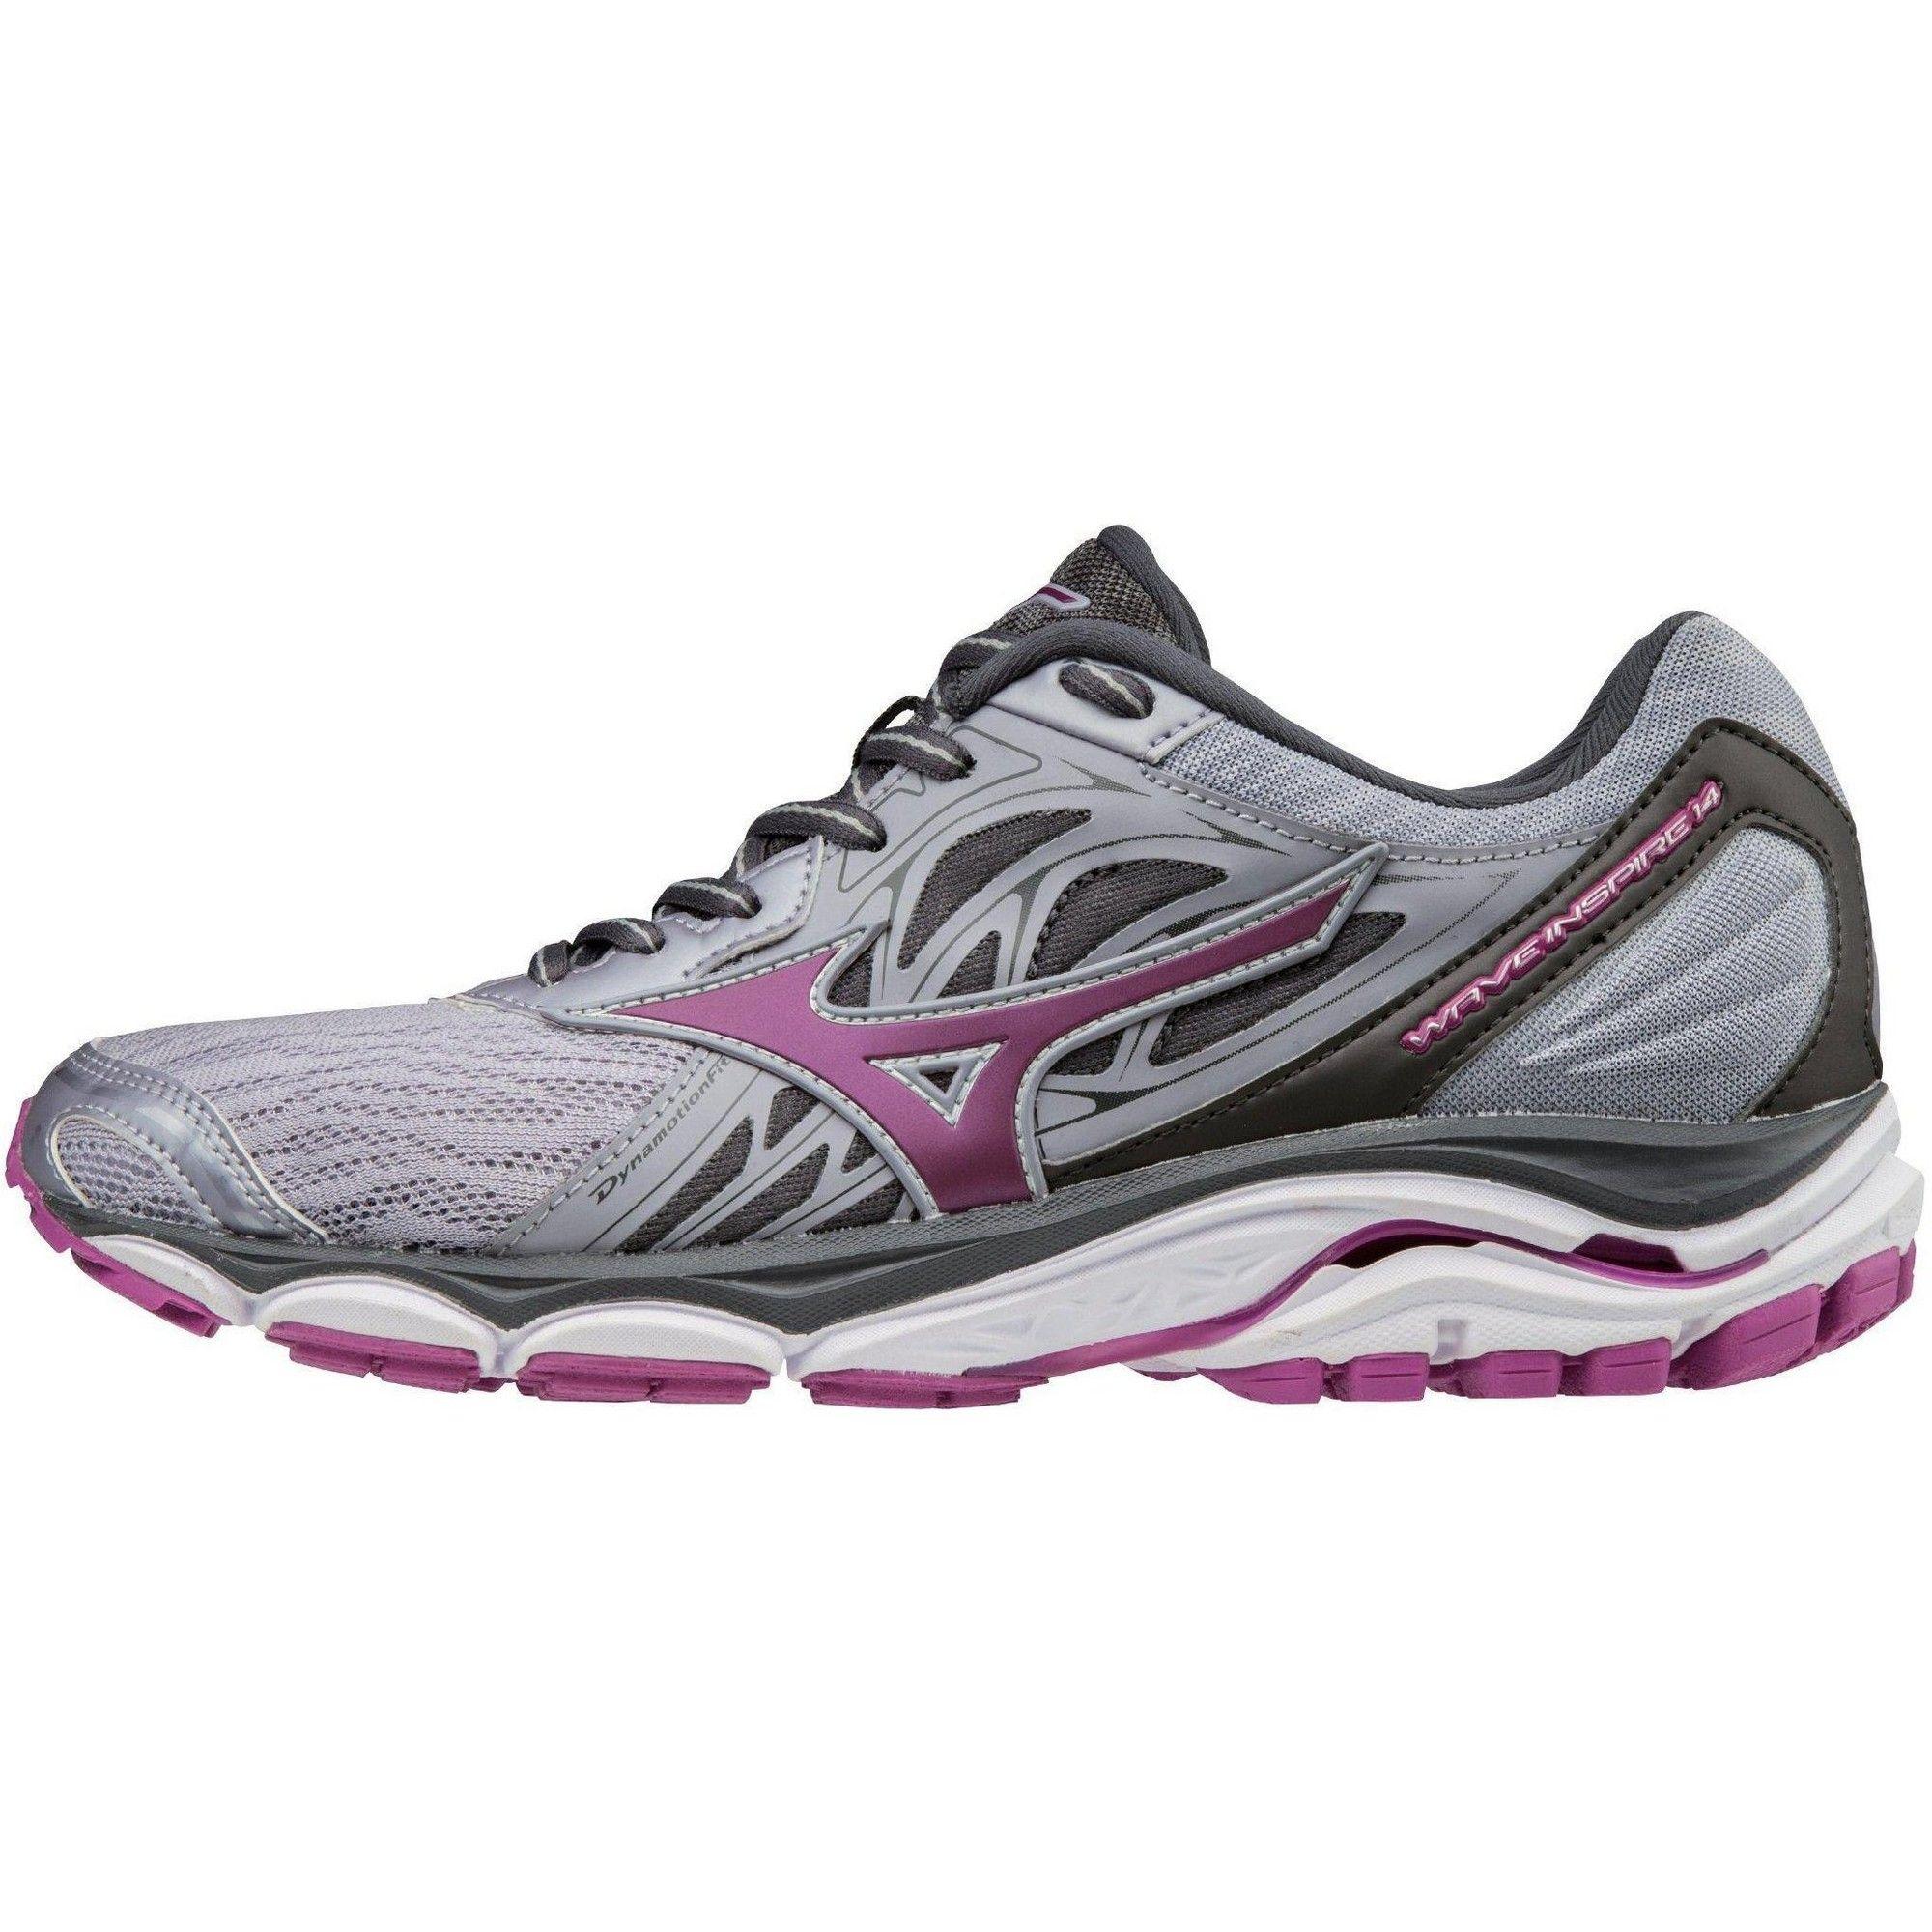 Mizuno Women S Wave Inspire 14 Wide Running Shoe Womens Size 7 In Color Dapple Gray Clover 9m6 Narrow Running Shoes Wide Running Shoes Large Size Womens Shoes